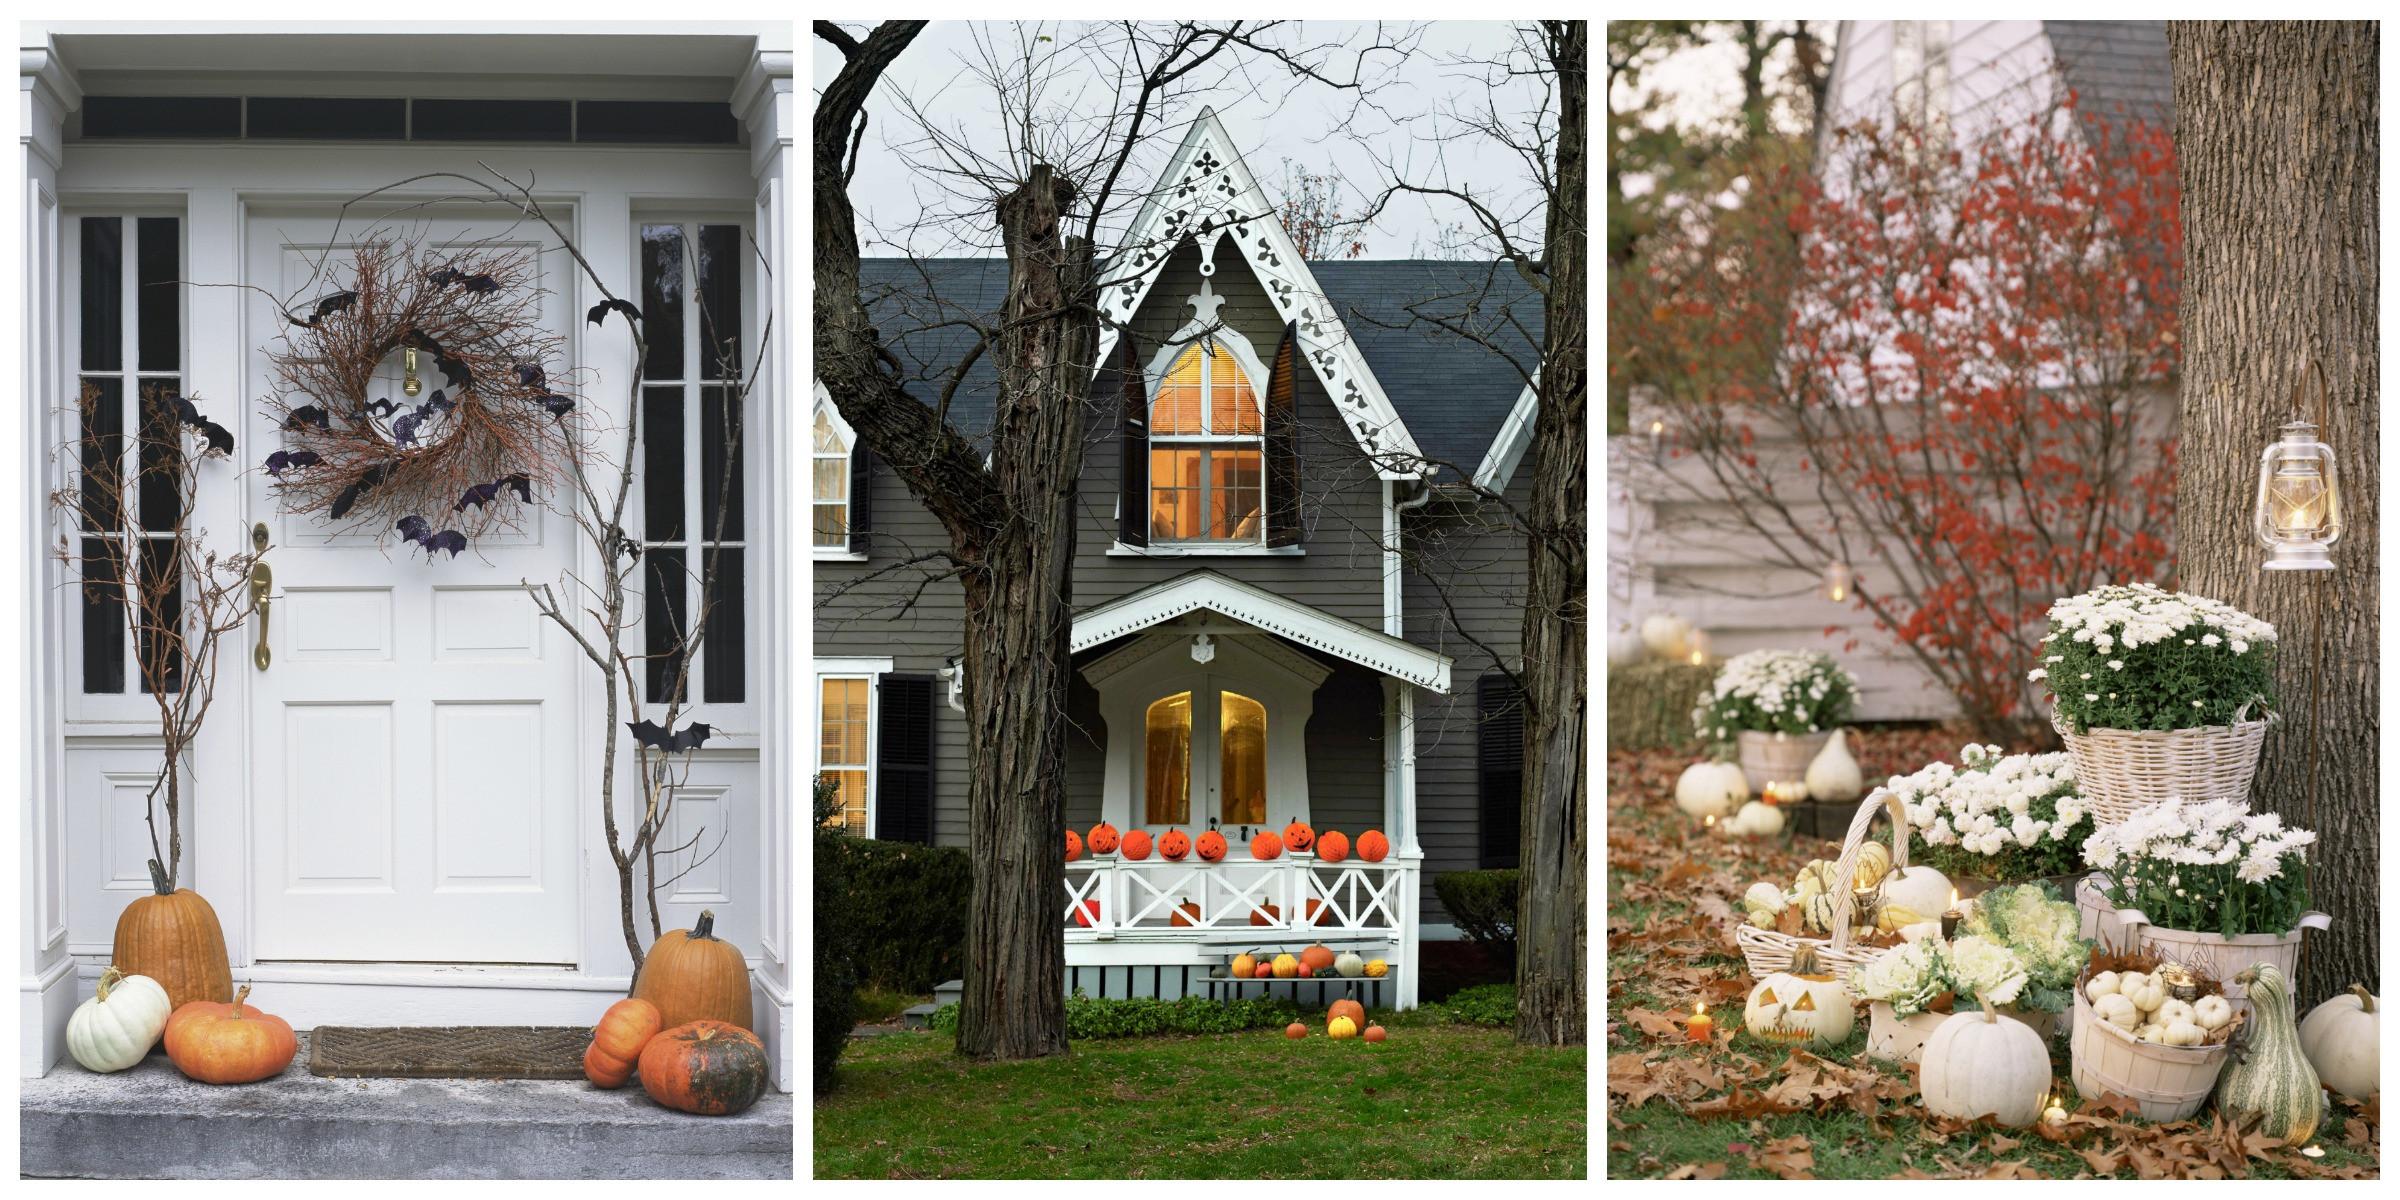 Porch Halloween Decorations  30 Best Outdoor Halloween Decoration Ideas Easy